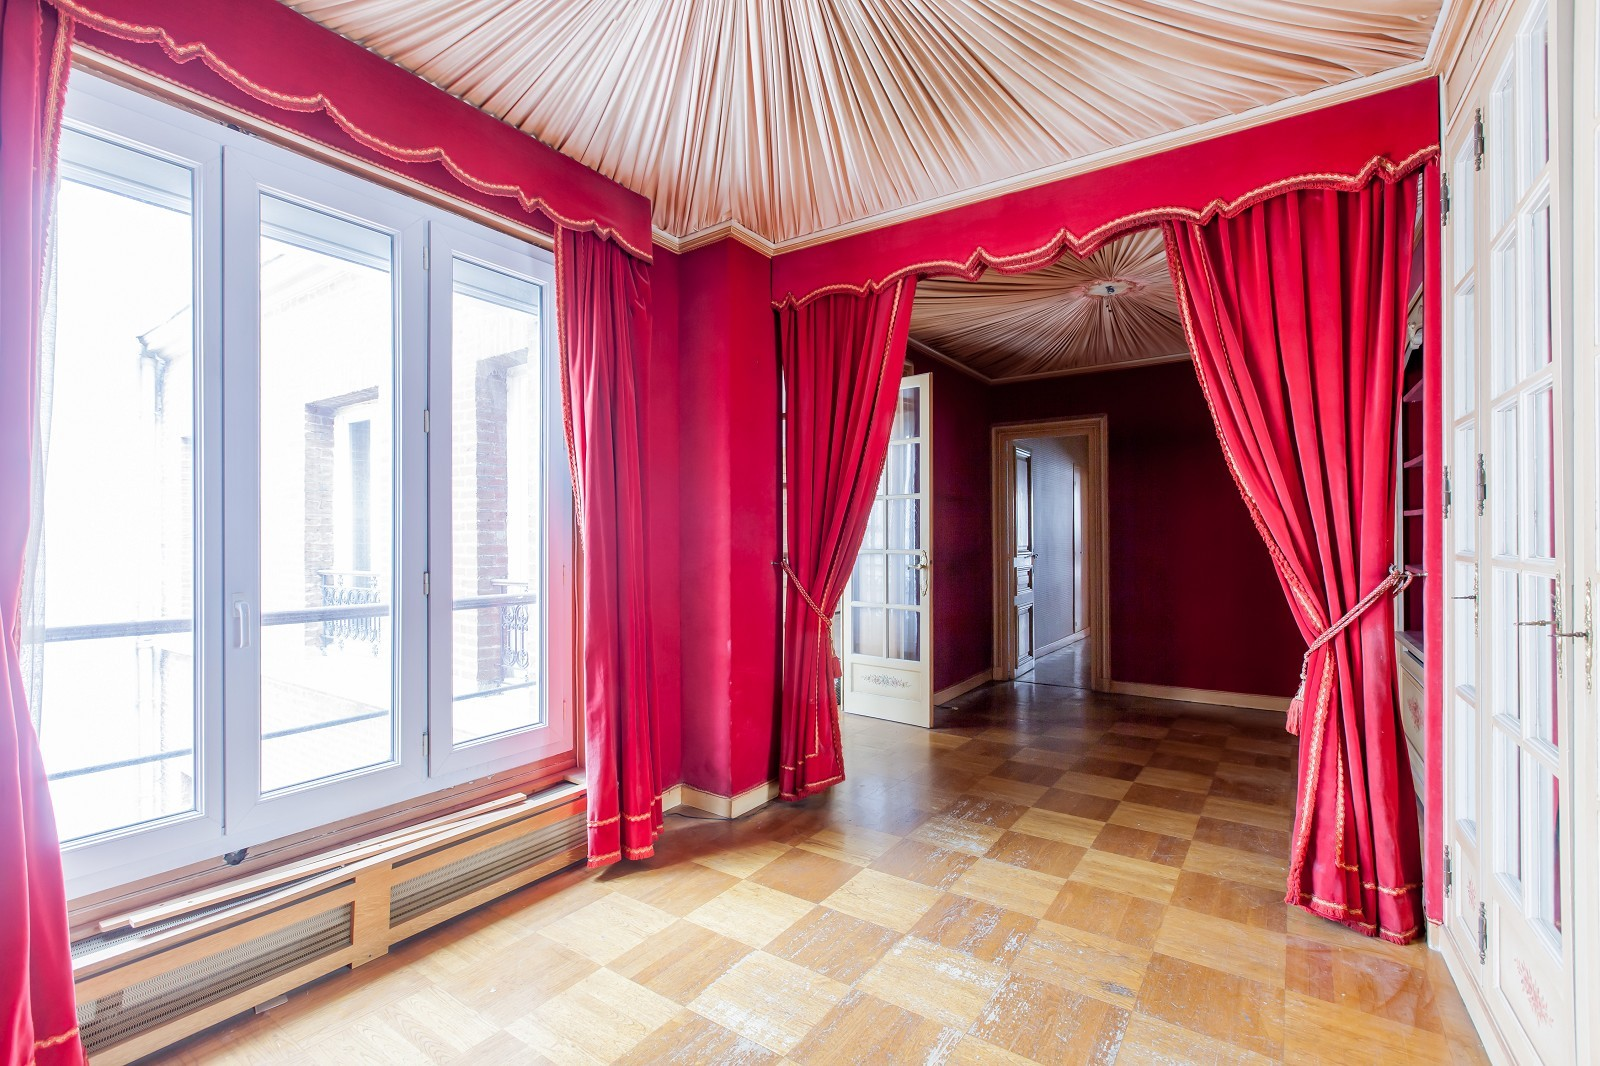 APARTMENT FOR SALE - PARIS 3 - TURENNE  - 3 BEDROOMS